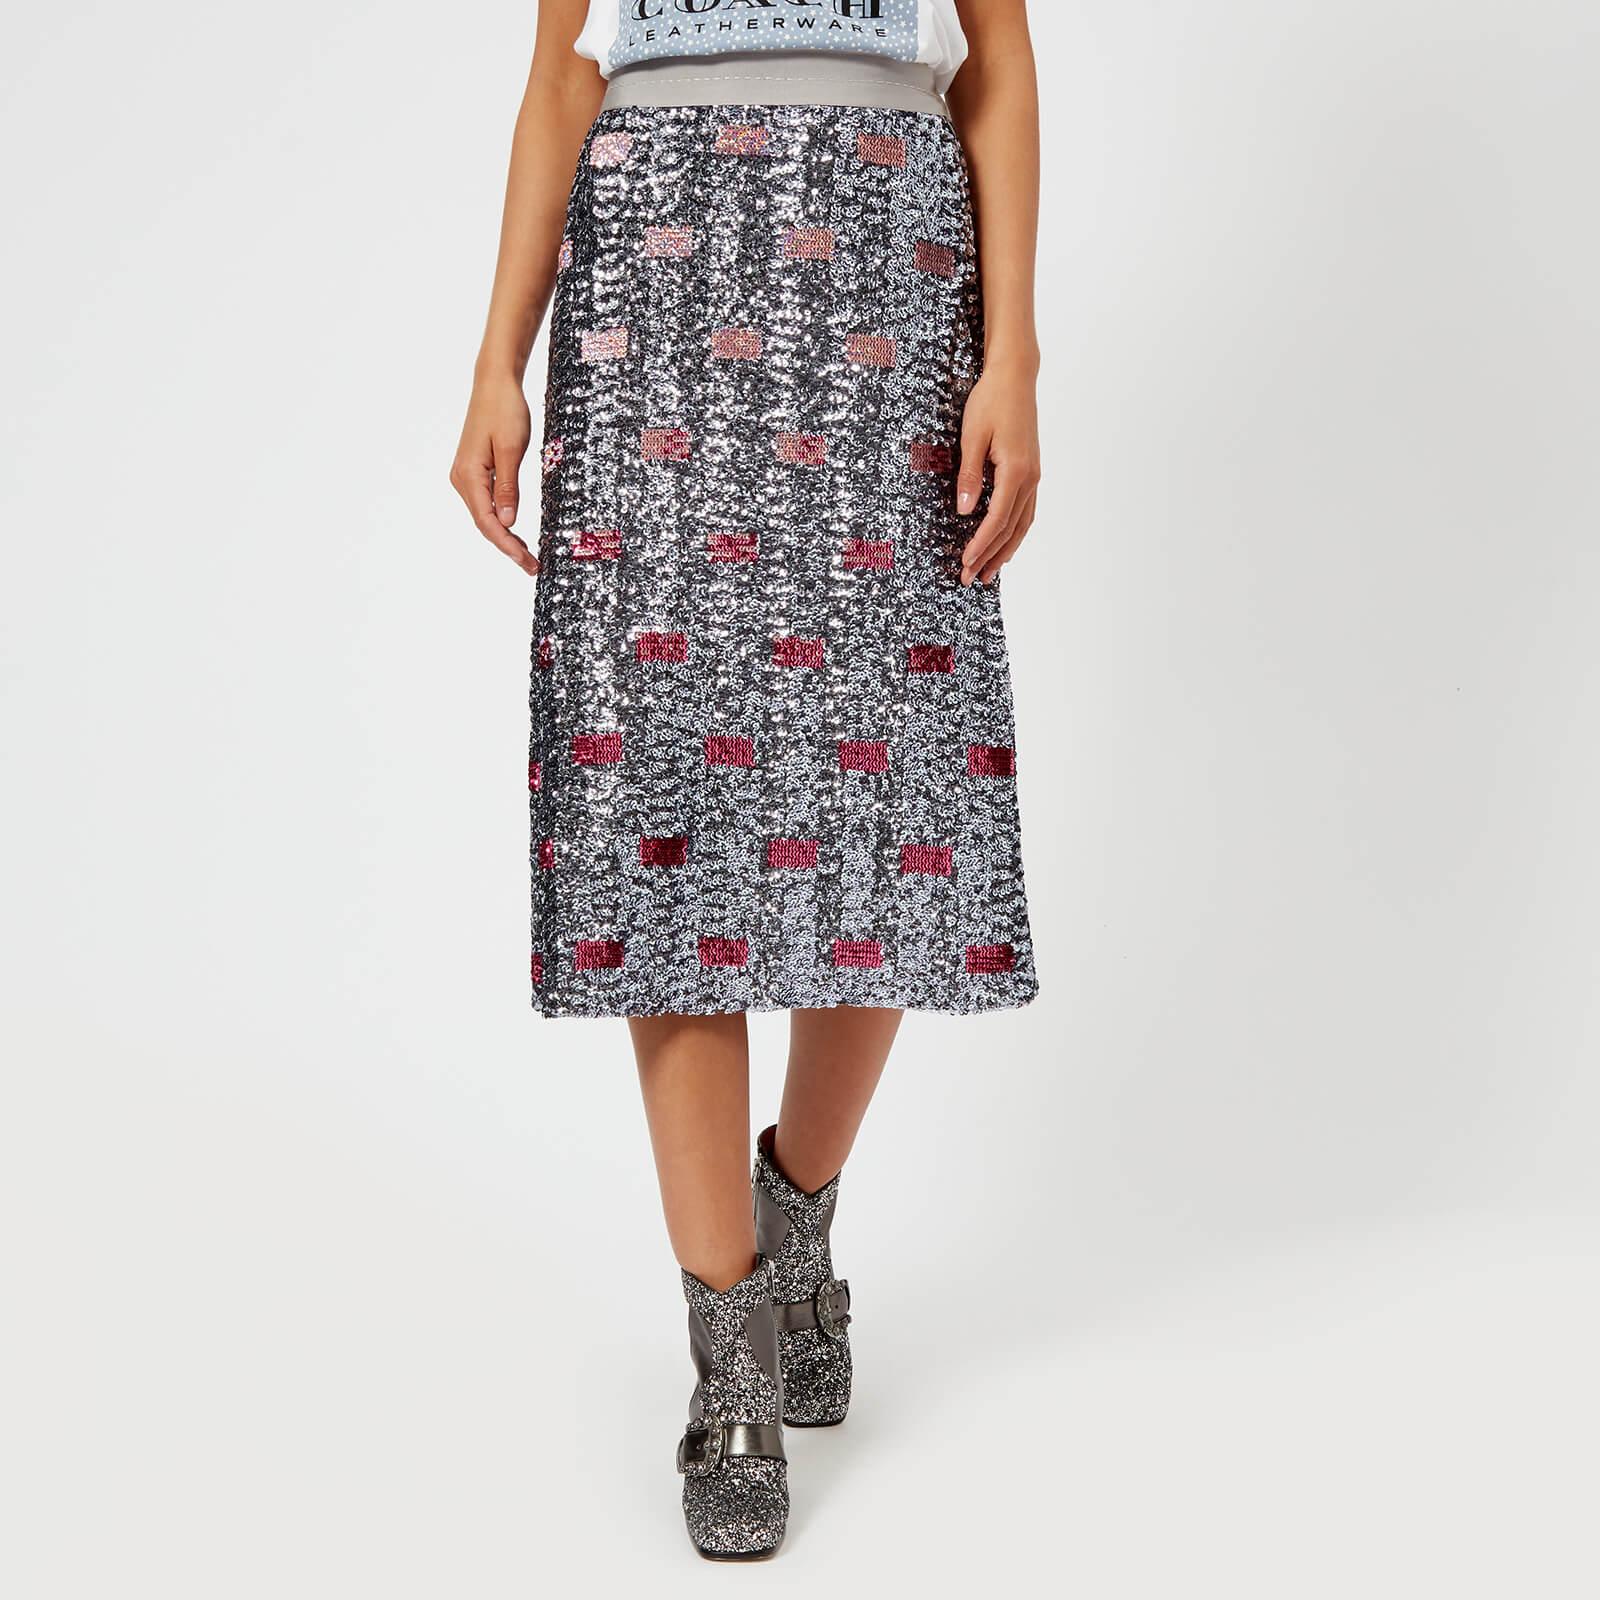 Coach 1941 Women's Long Embellished Skirt – Pink/Silver